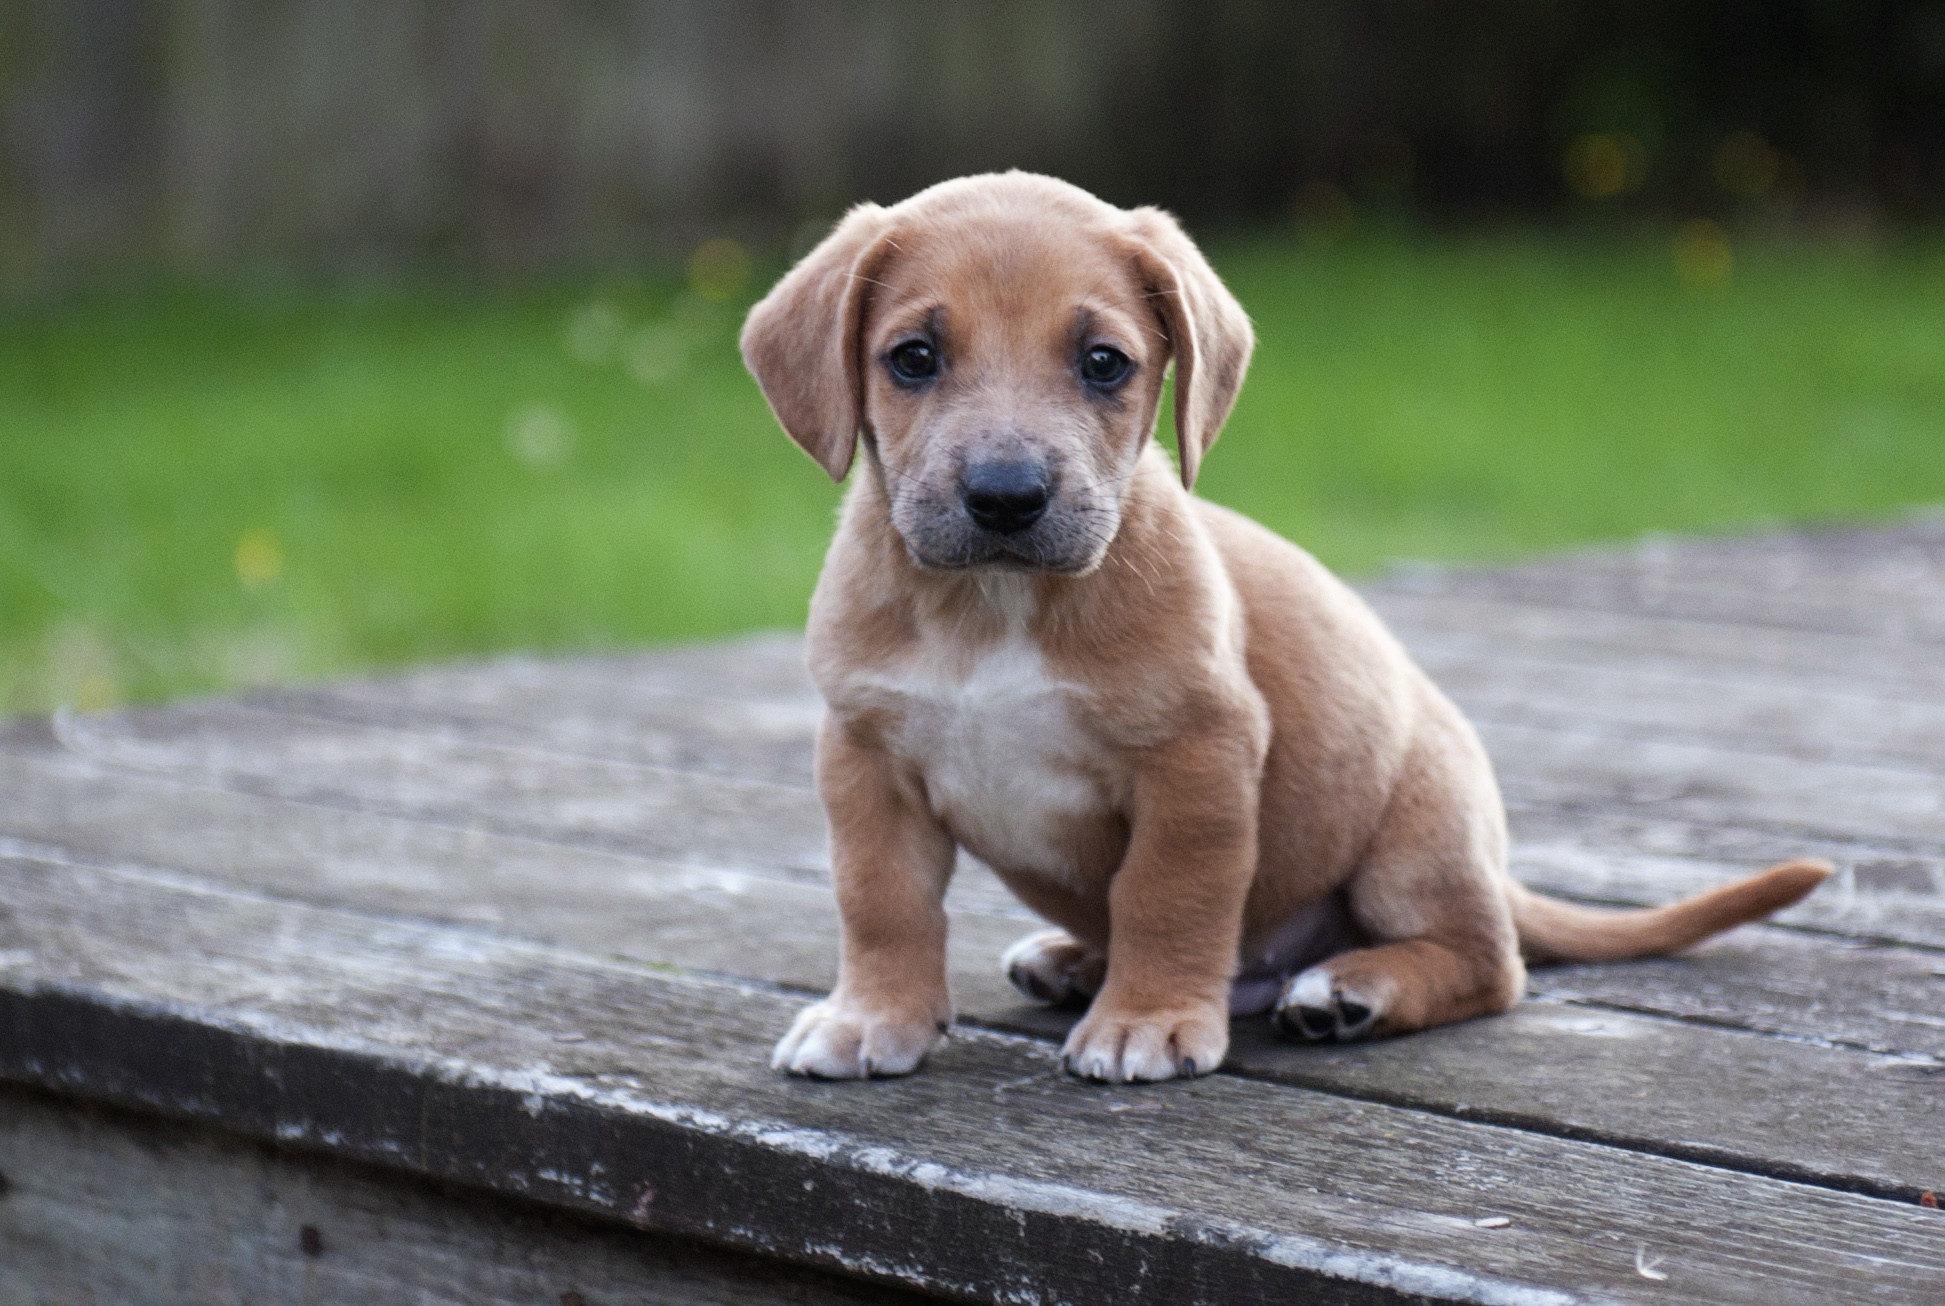 cute pets A4